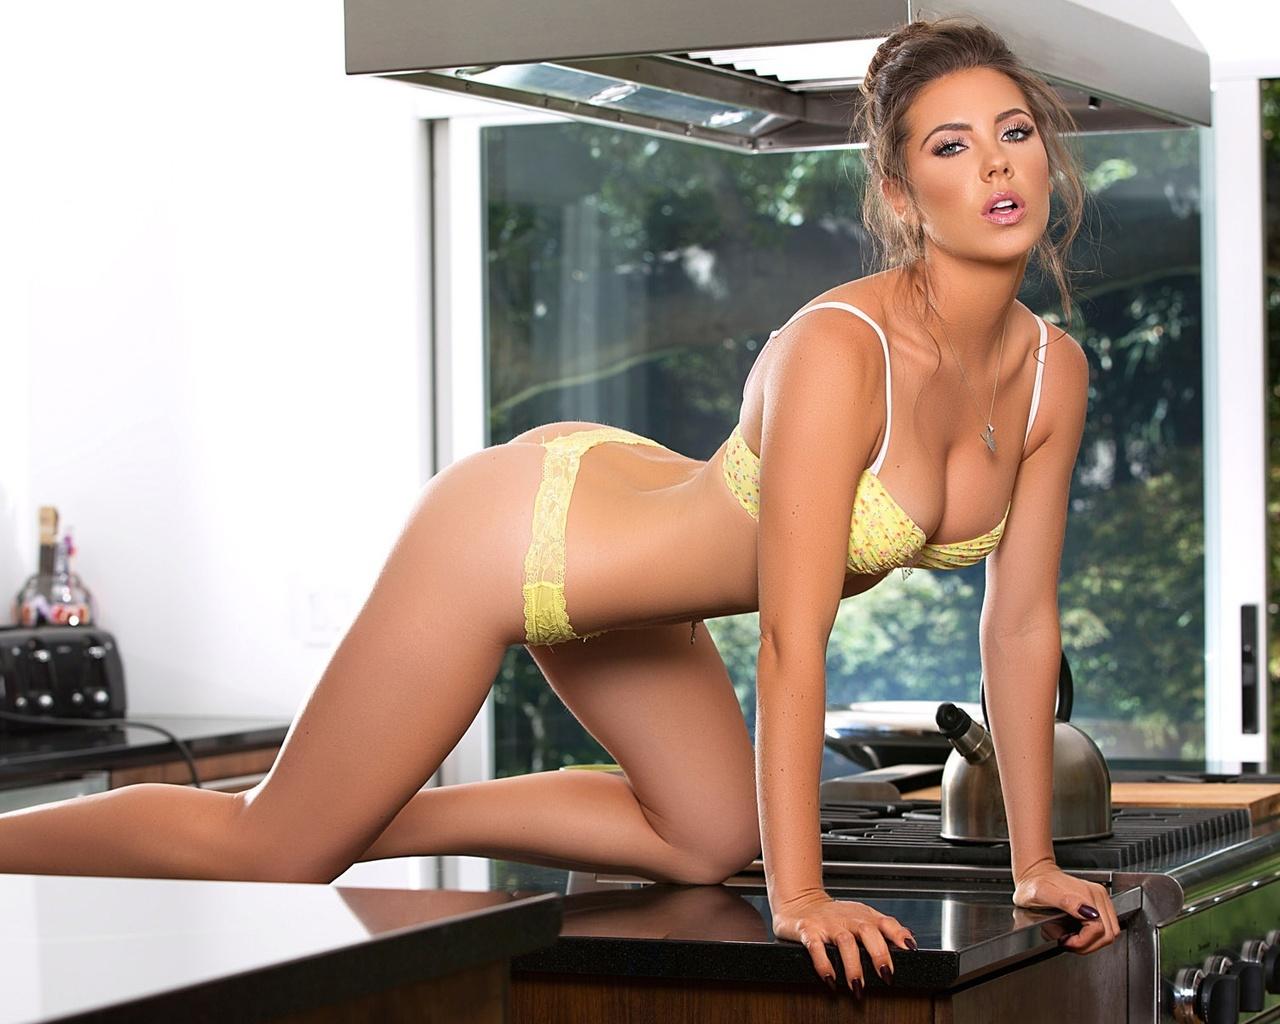 model, kitchen, beautiful, panties, bra, plate, brown hair, figure, sexy, pose, gia ramey, look, kettle